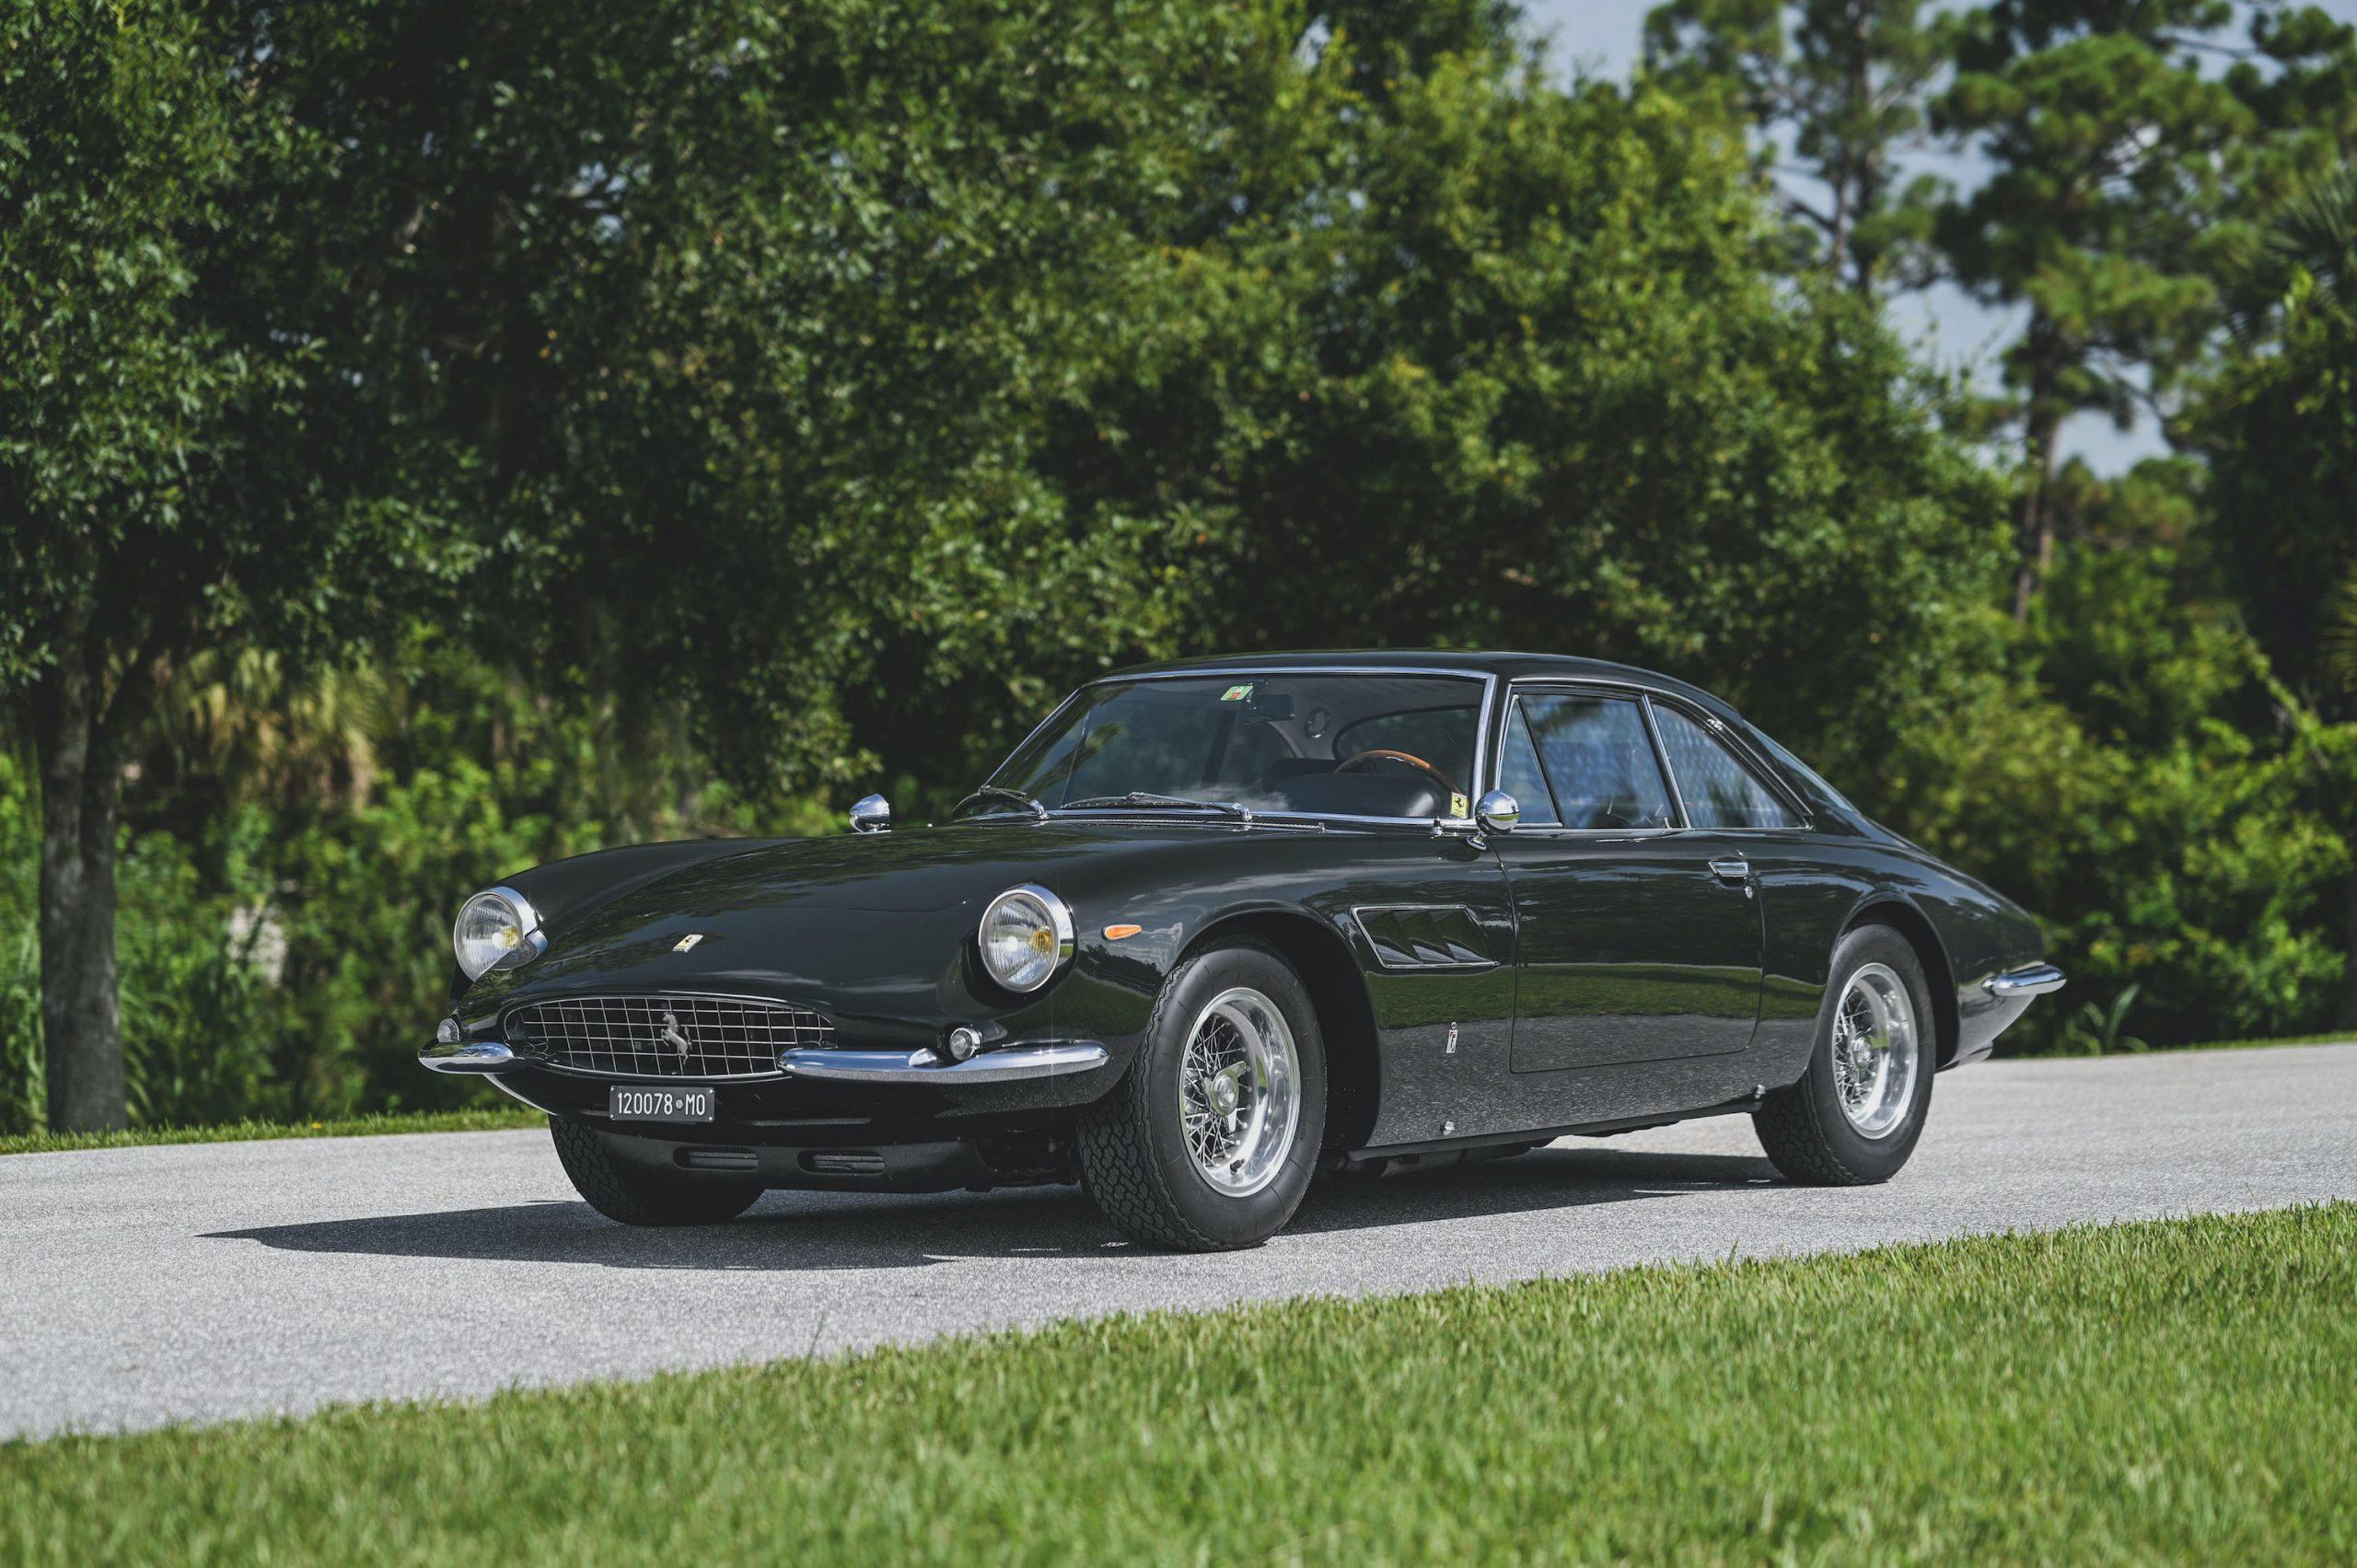 Ferrari 500 Superfast front three-quarter